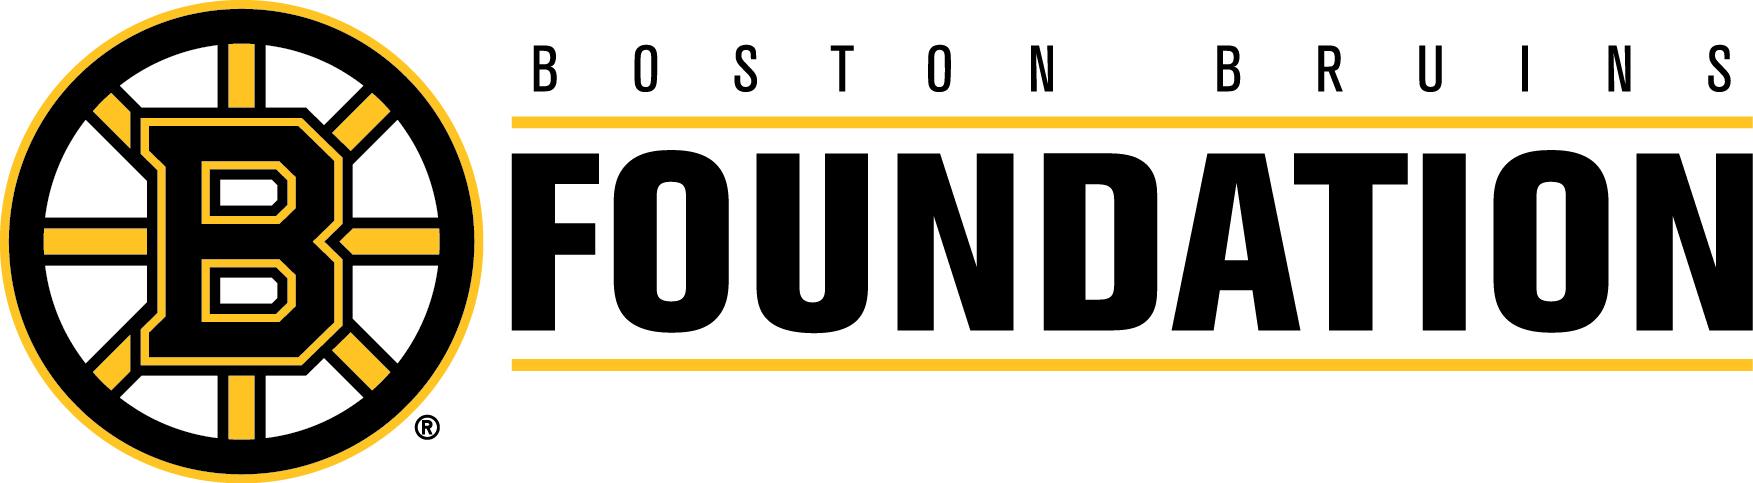 Boston Foundation .JPG